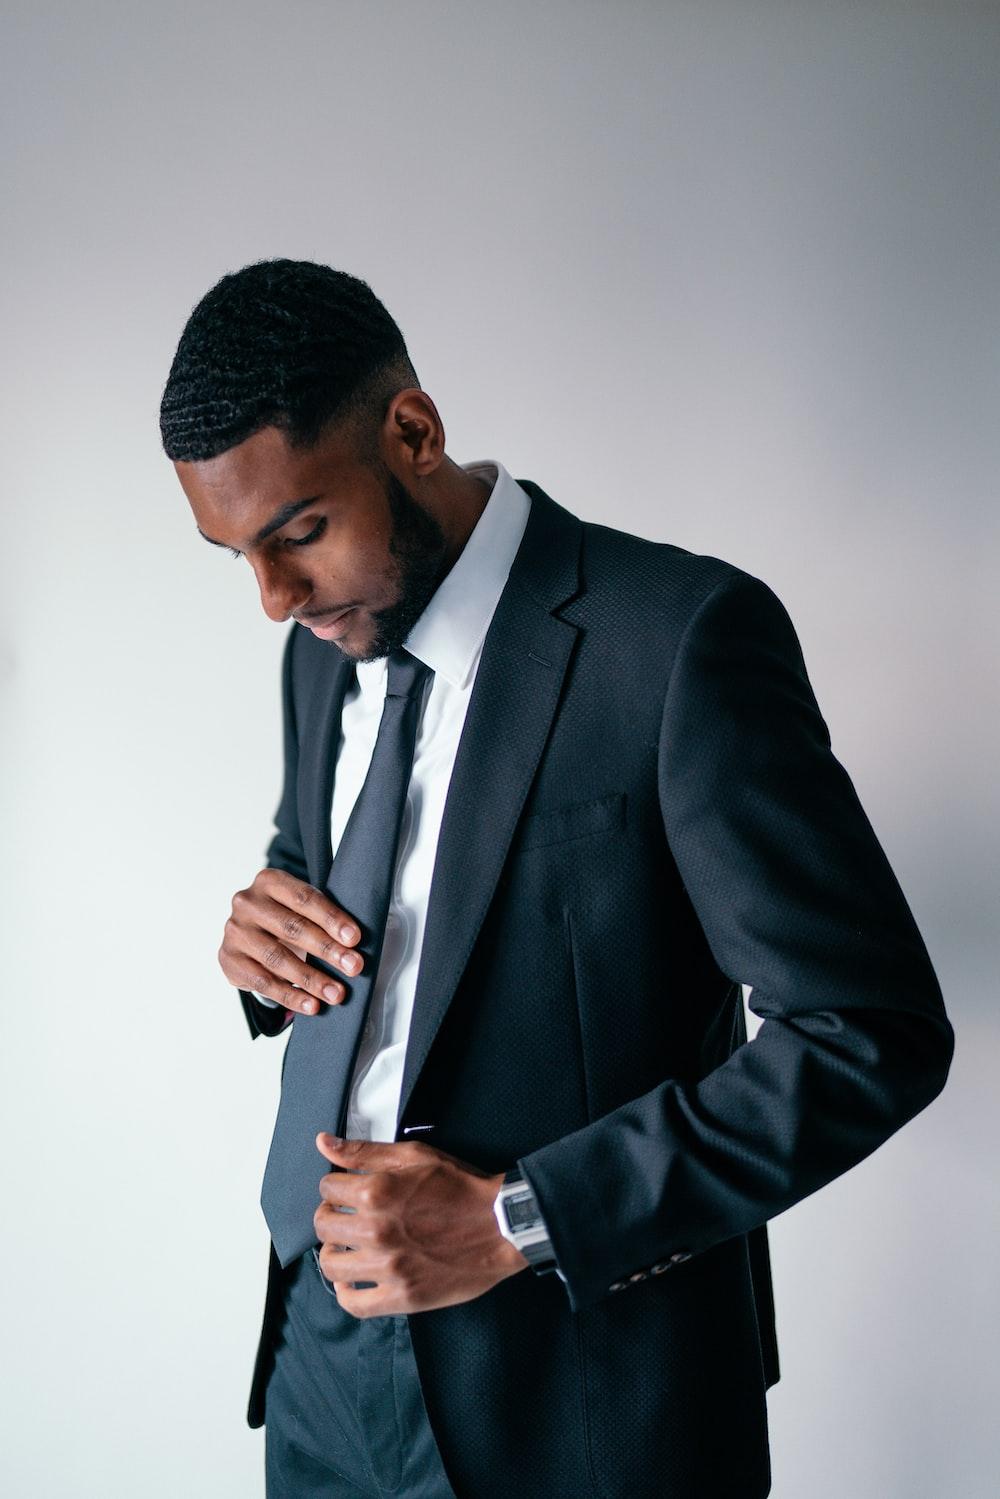 man in black suit holding black smartphone